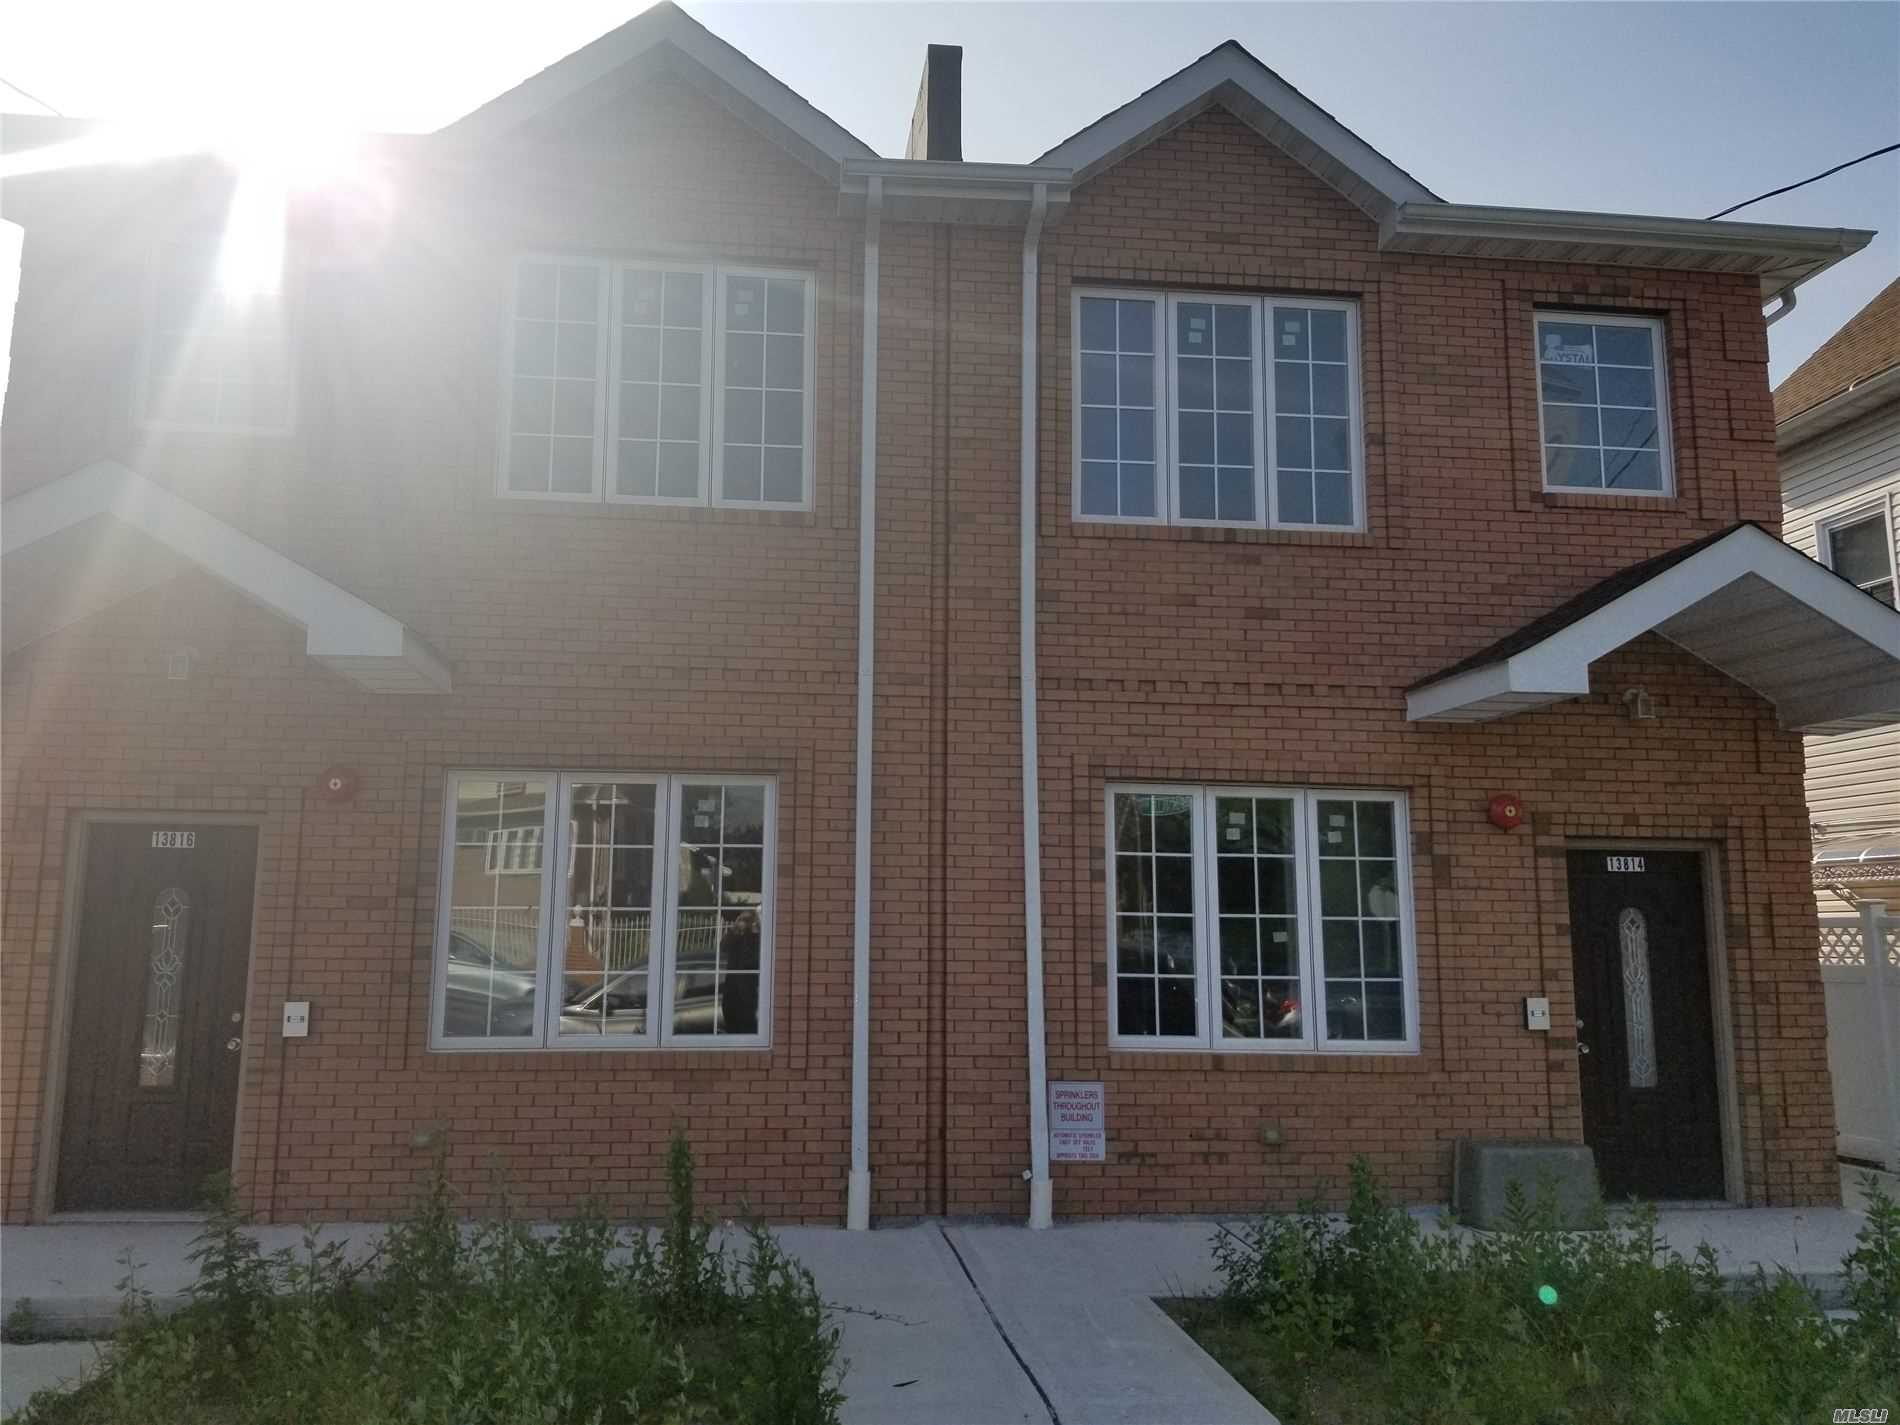 Property for sale at 13816 Brookville Boulevard, Rosedale NY 11422, Rosedale,  New York 11422